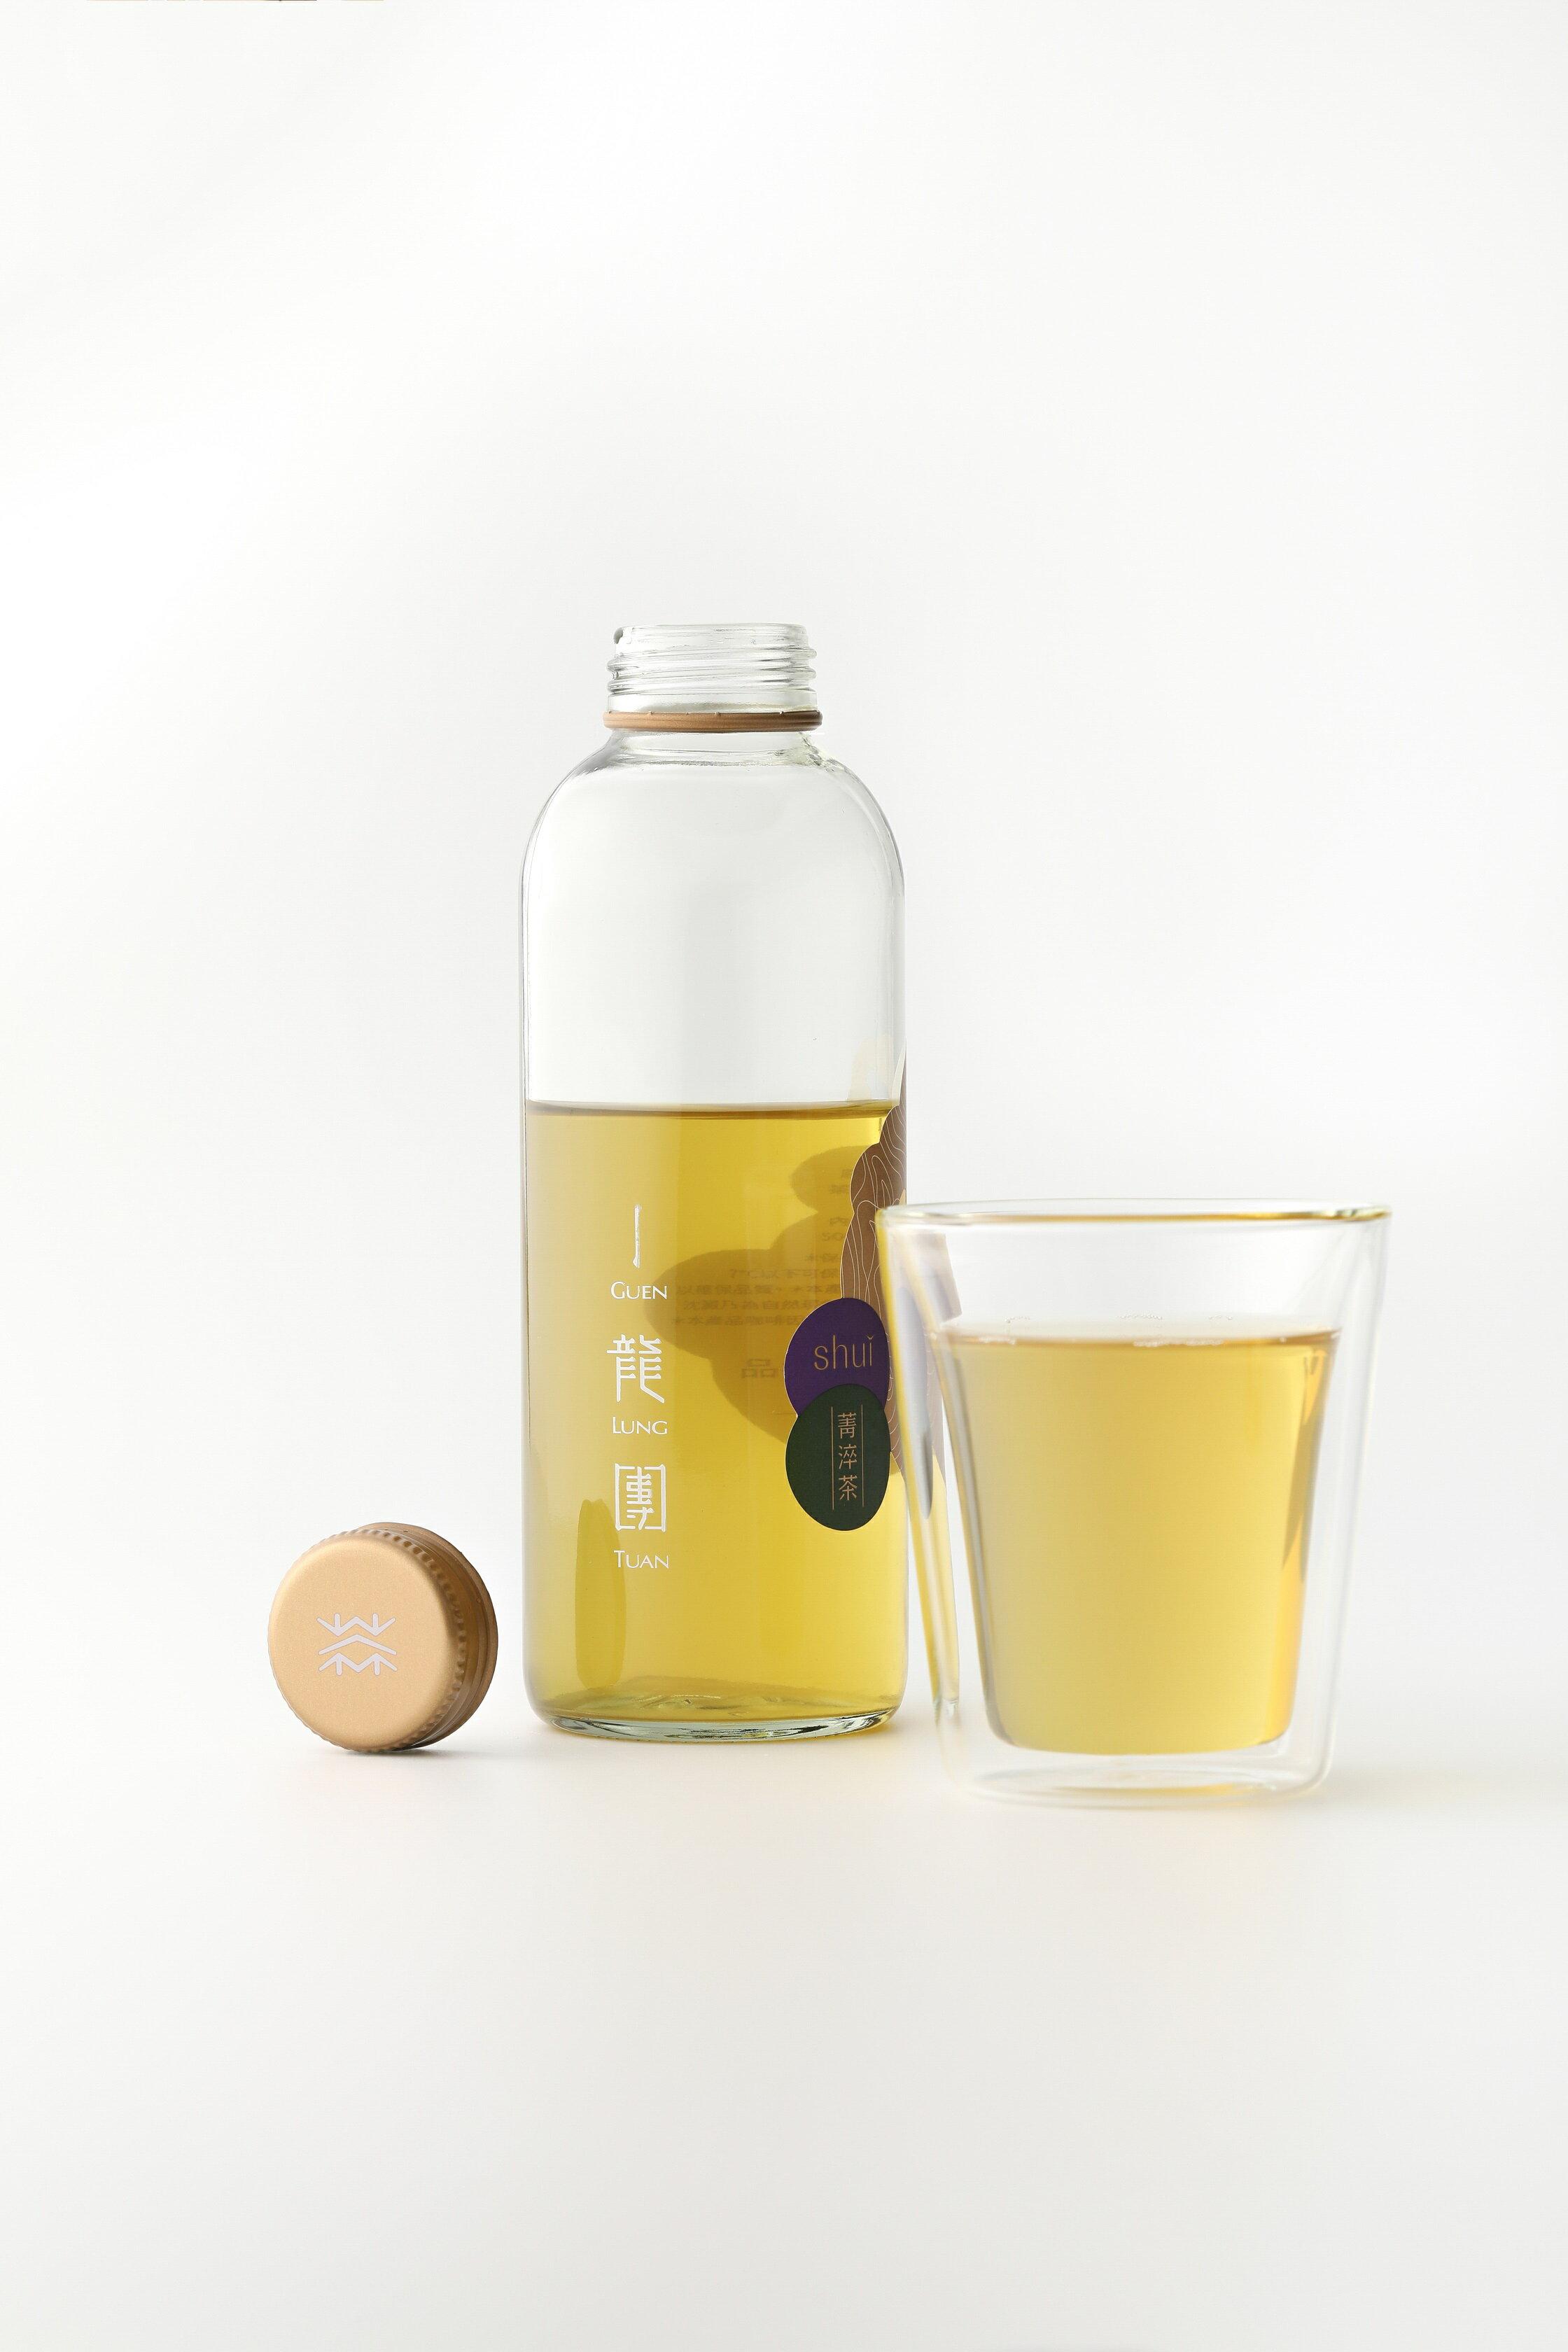 【菁淬茶】凍頂烏龍茶 - 早冬尋露 (500ml / 瓶) /Zao Dong Syun Lu/Dew in Early Winter 0